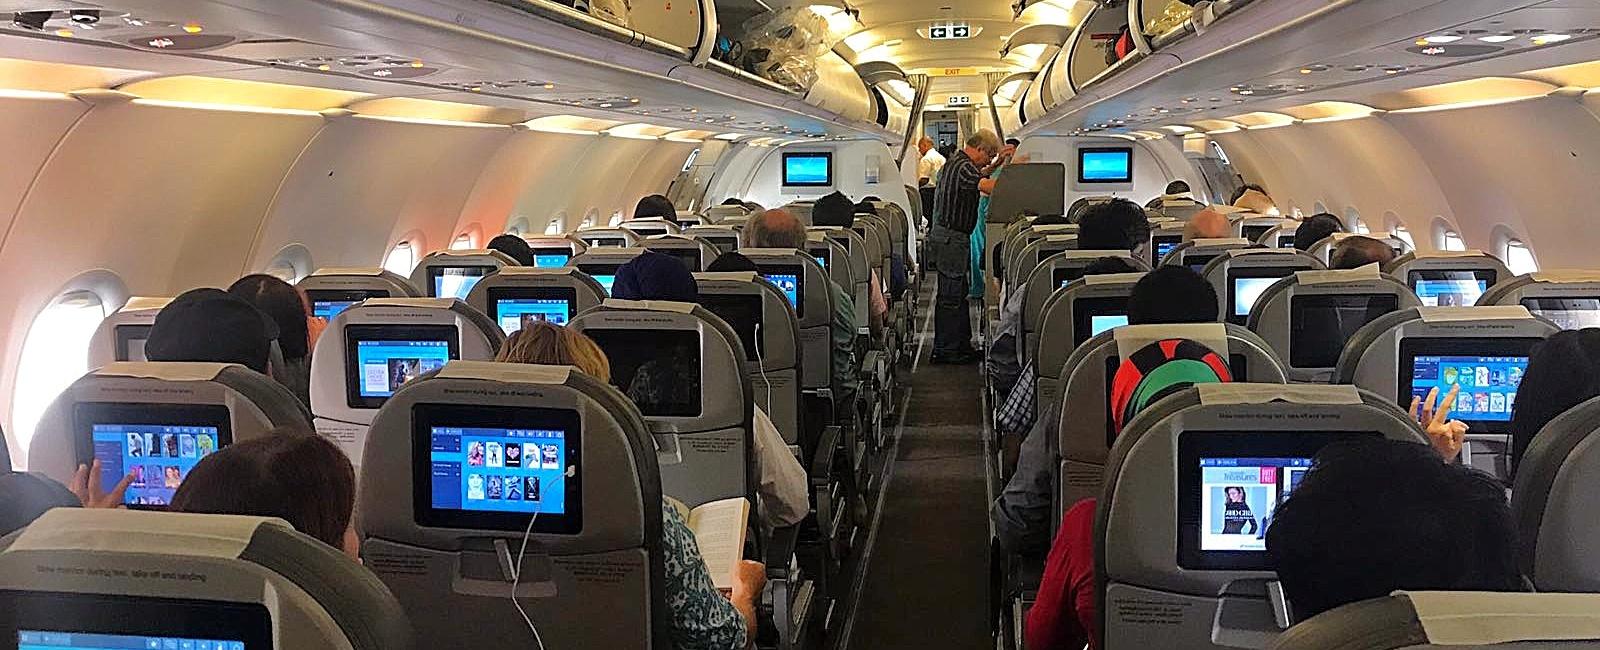 Sri Lanka Airlines Flight Review Singapore Travel Blogger Jensen Chua